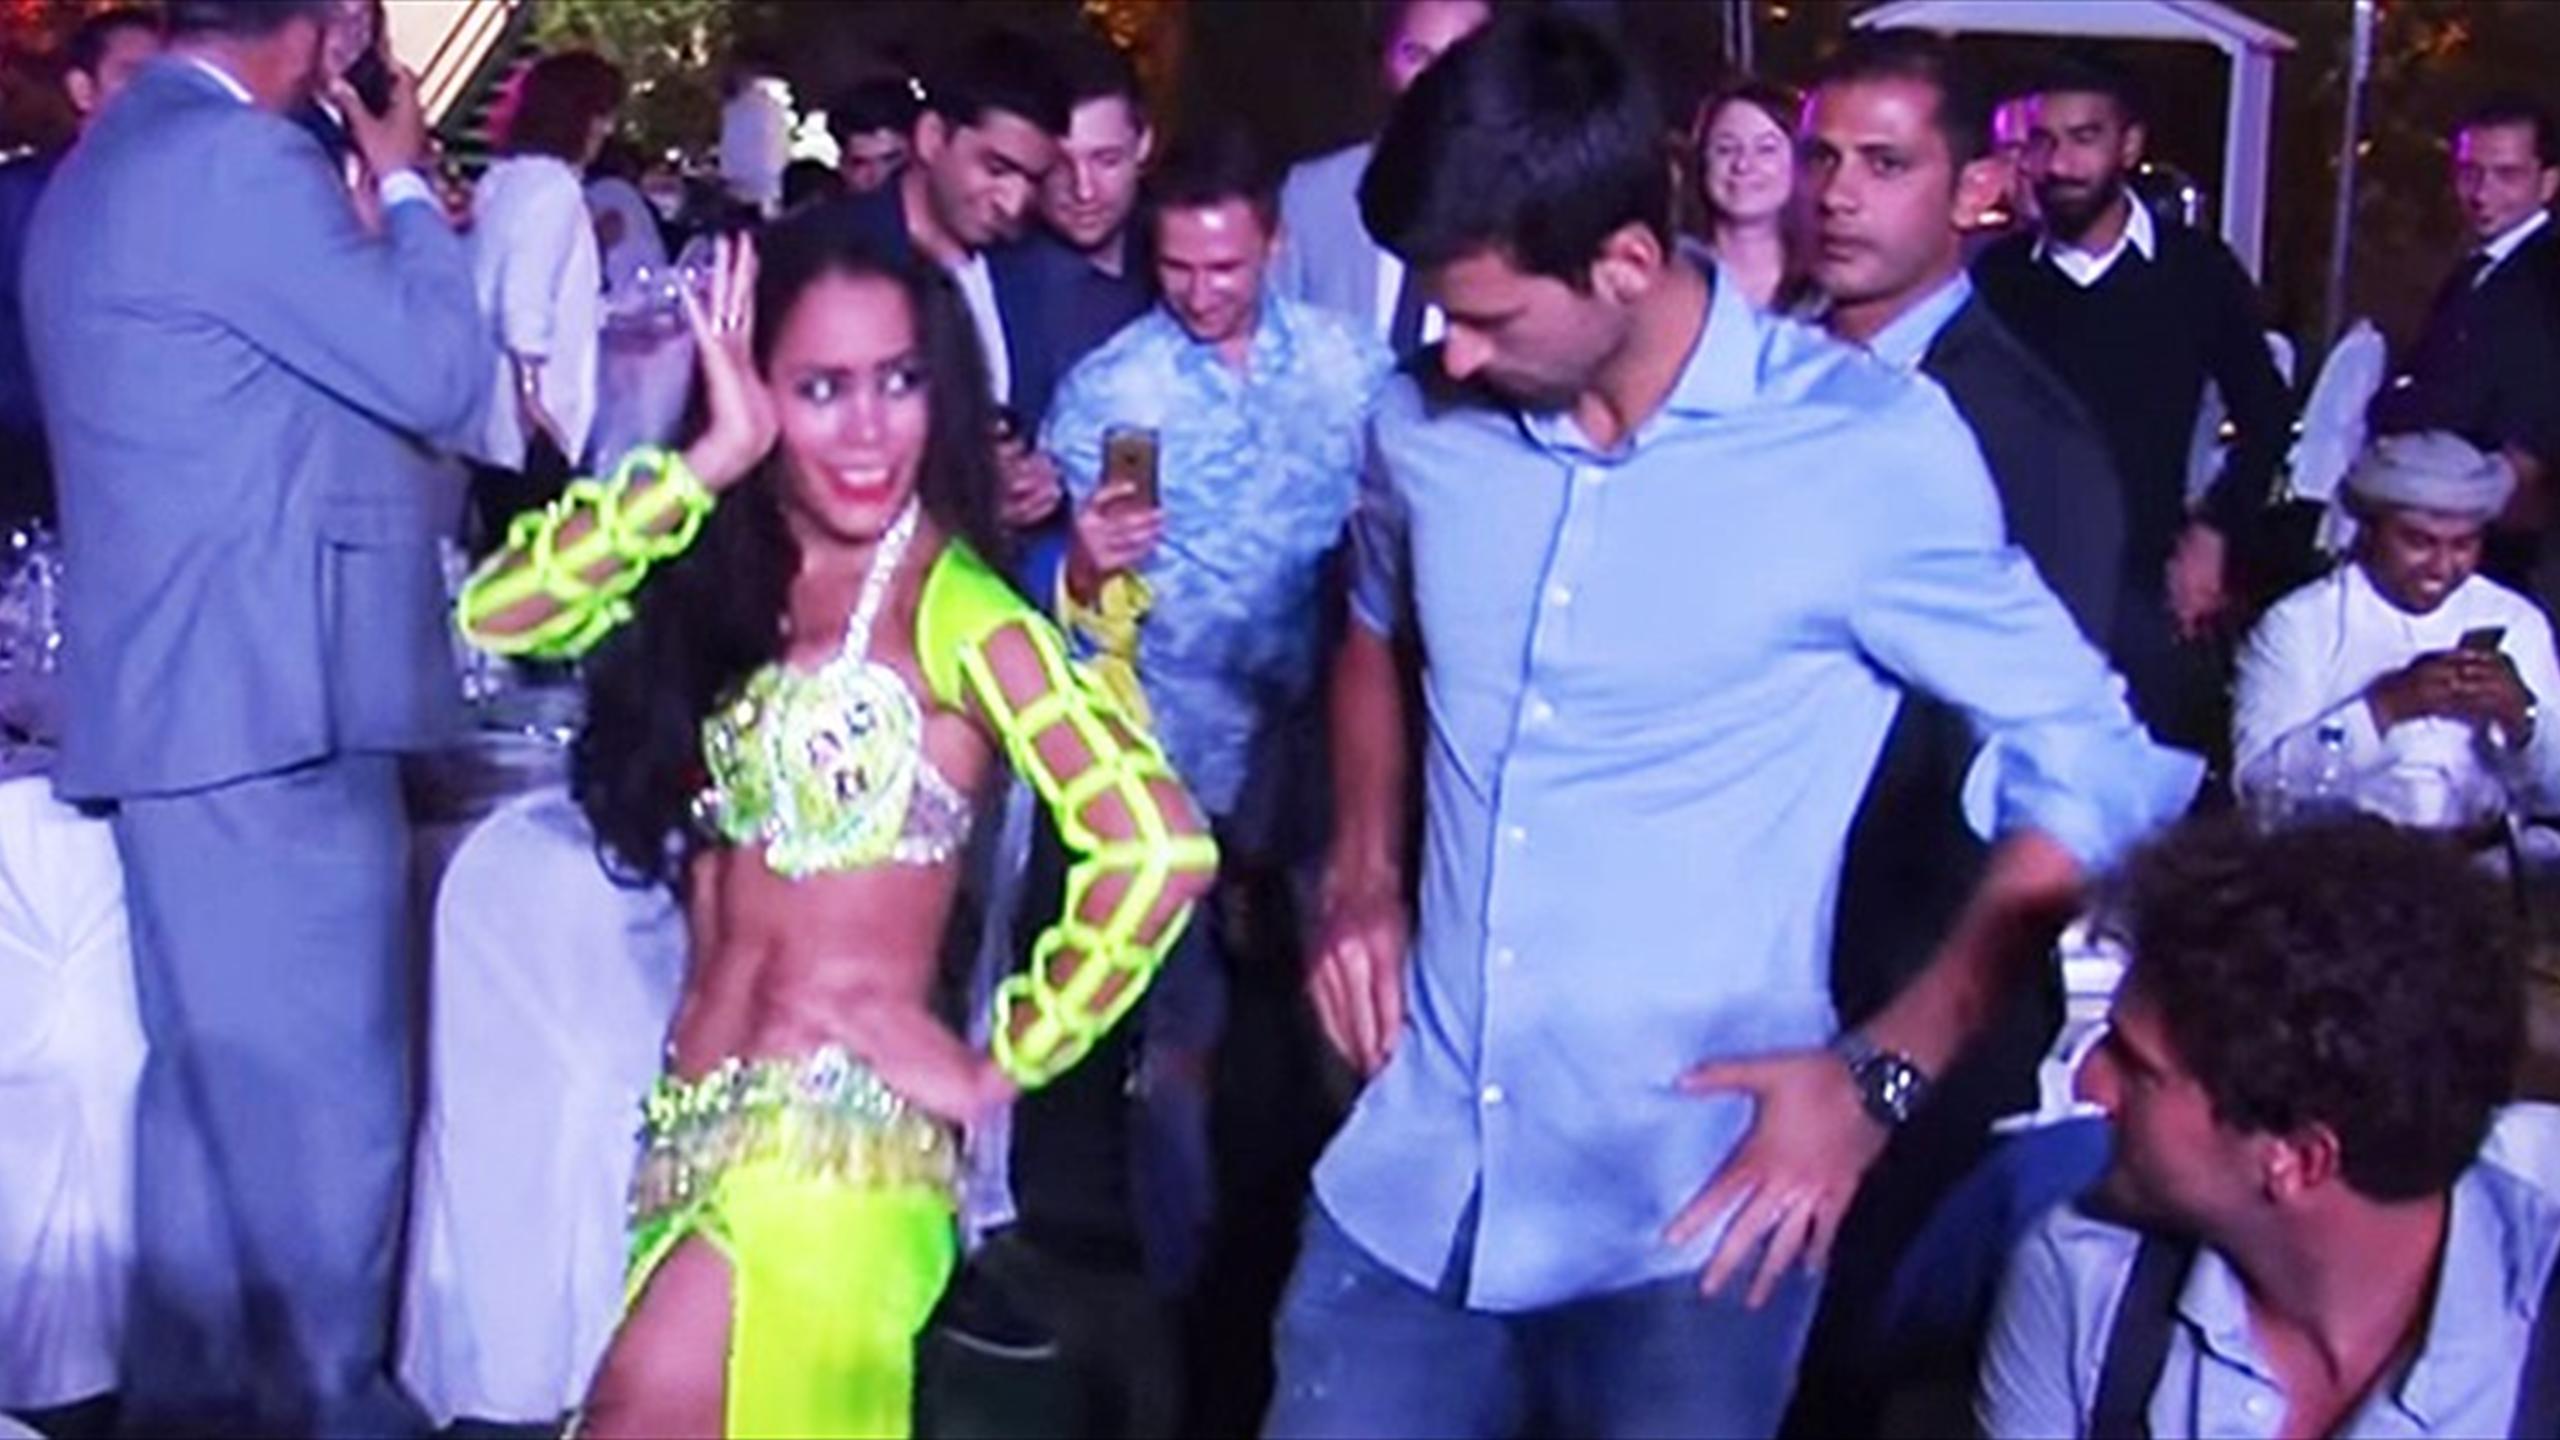 Novak Djokovic belly-dancing in Dubai (Youtube)